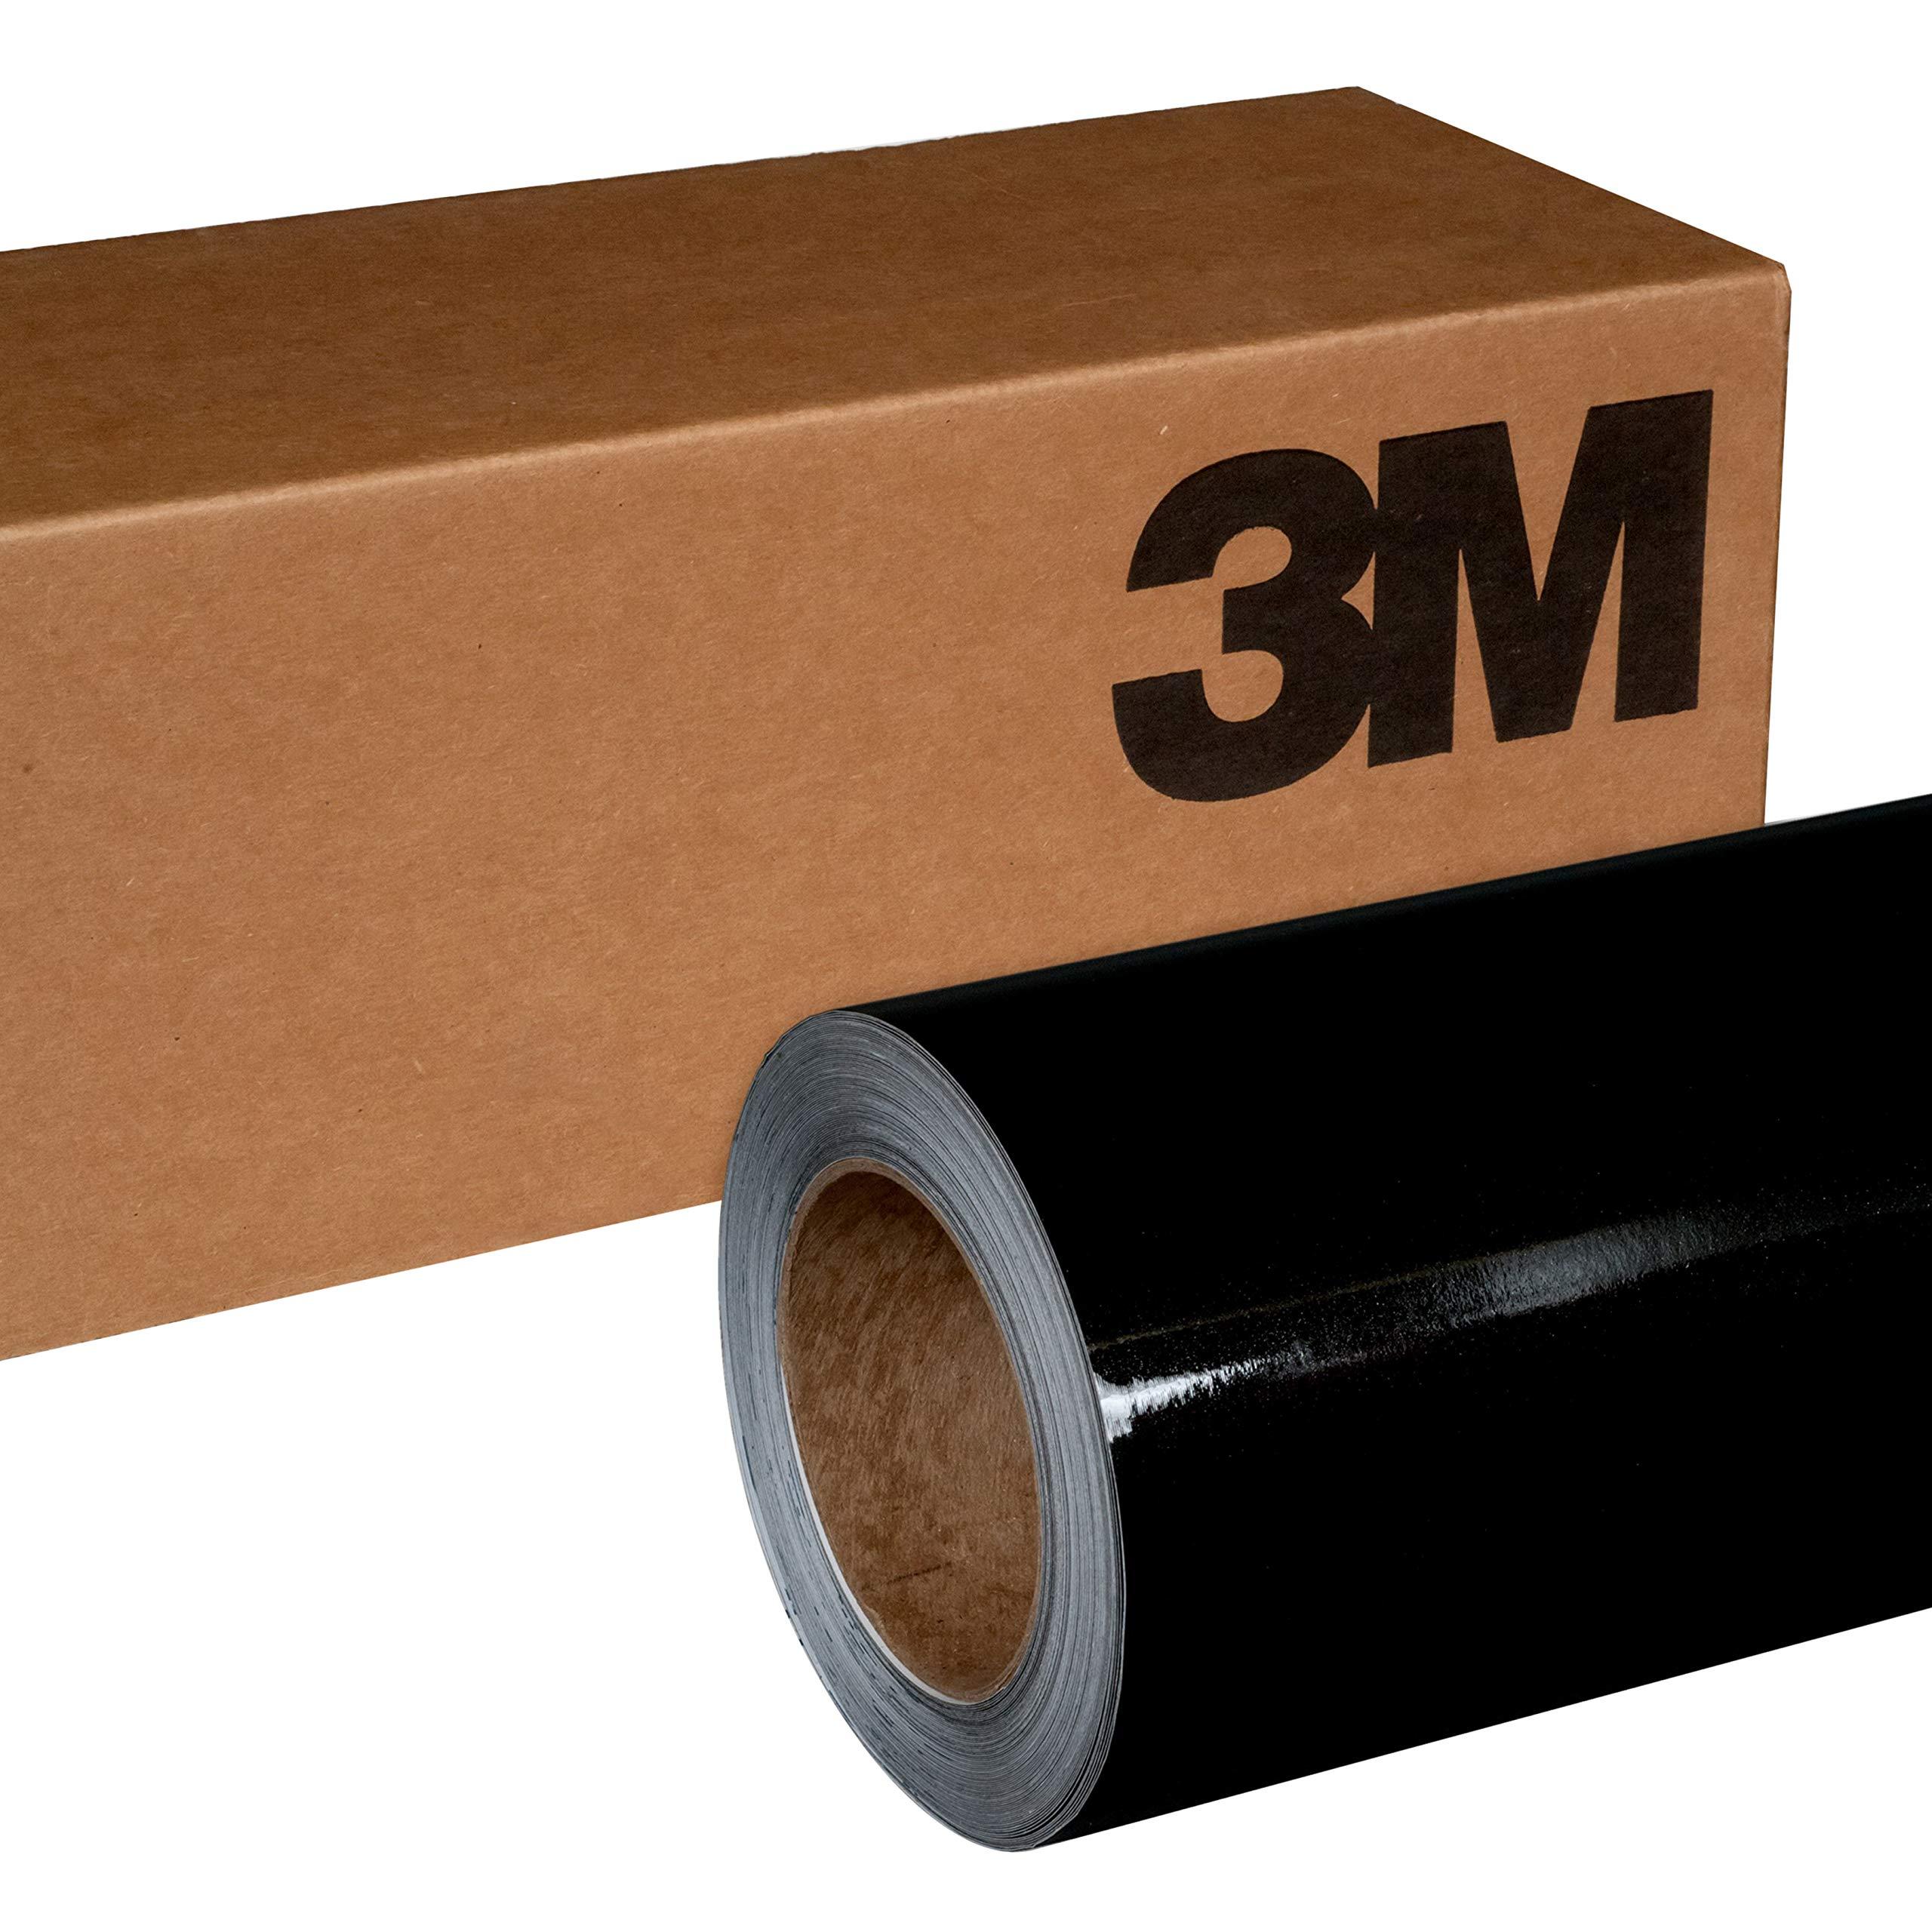 3M 1080 G212 Gloss Black Metallic 5ft x 5ft (25 Sq/ft) Car Wrap Vinyl Film by 3M (Image #1)